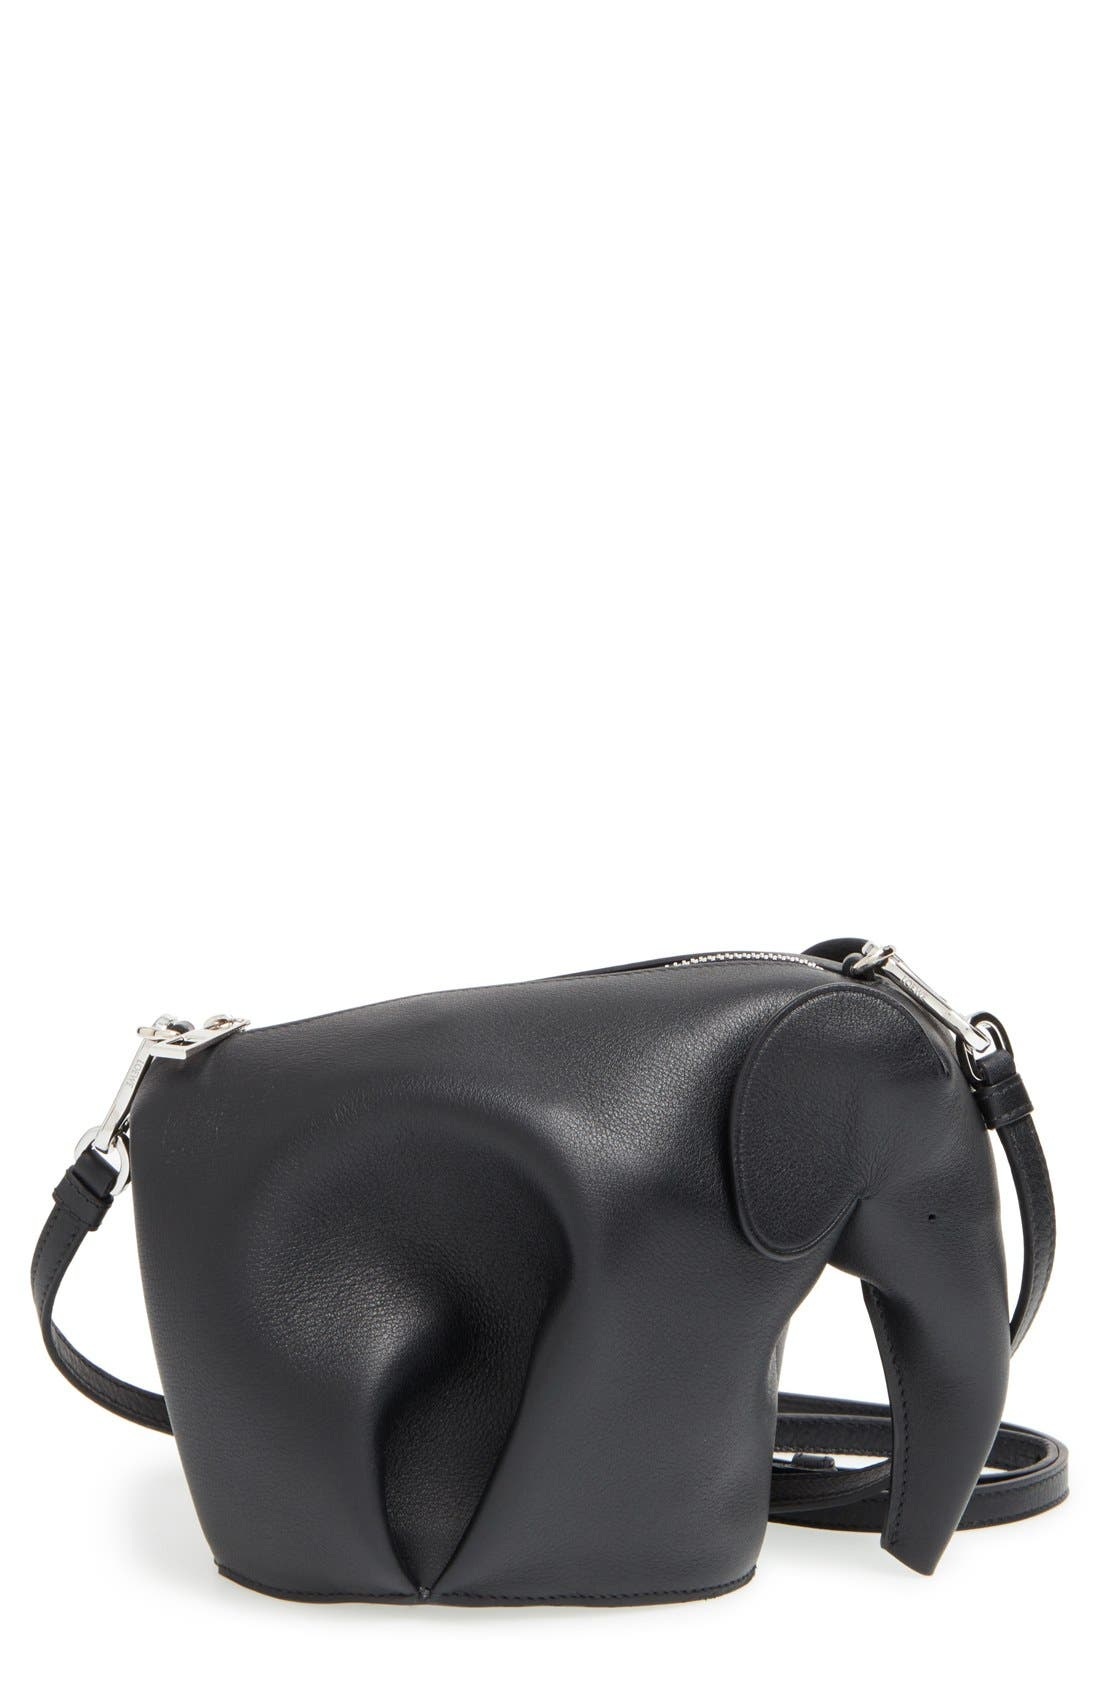 Alternate Image 1 Selected - Loewe 'Mini Elephant' Crossbody Bag